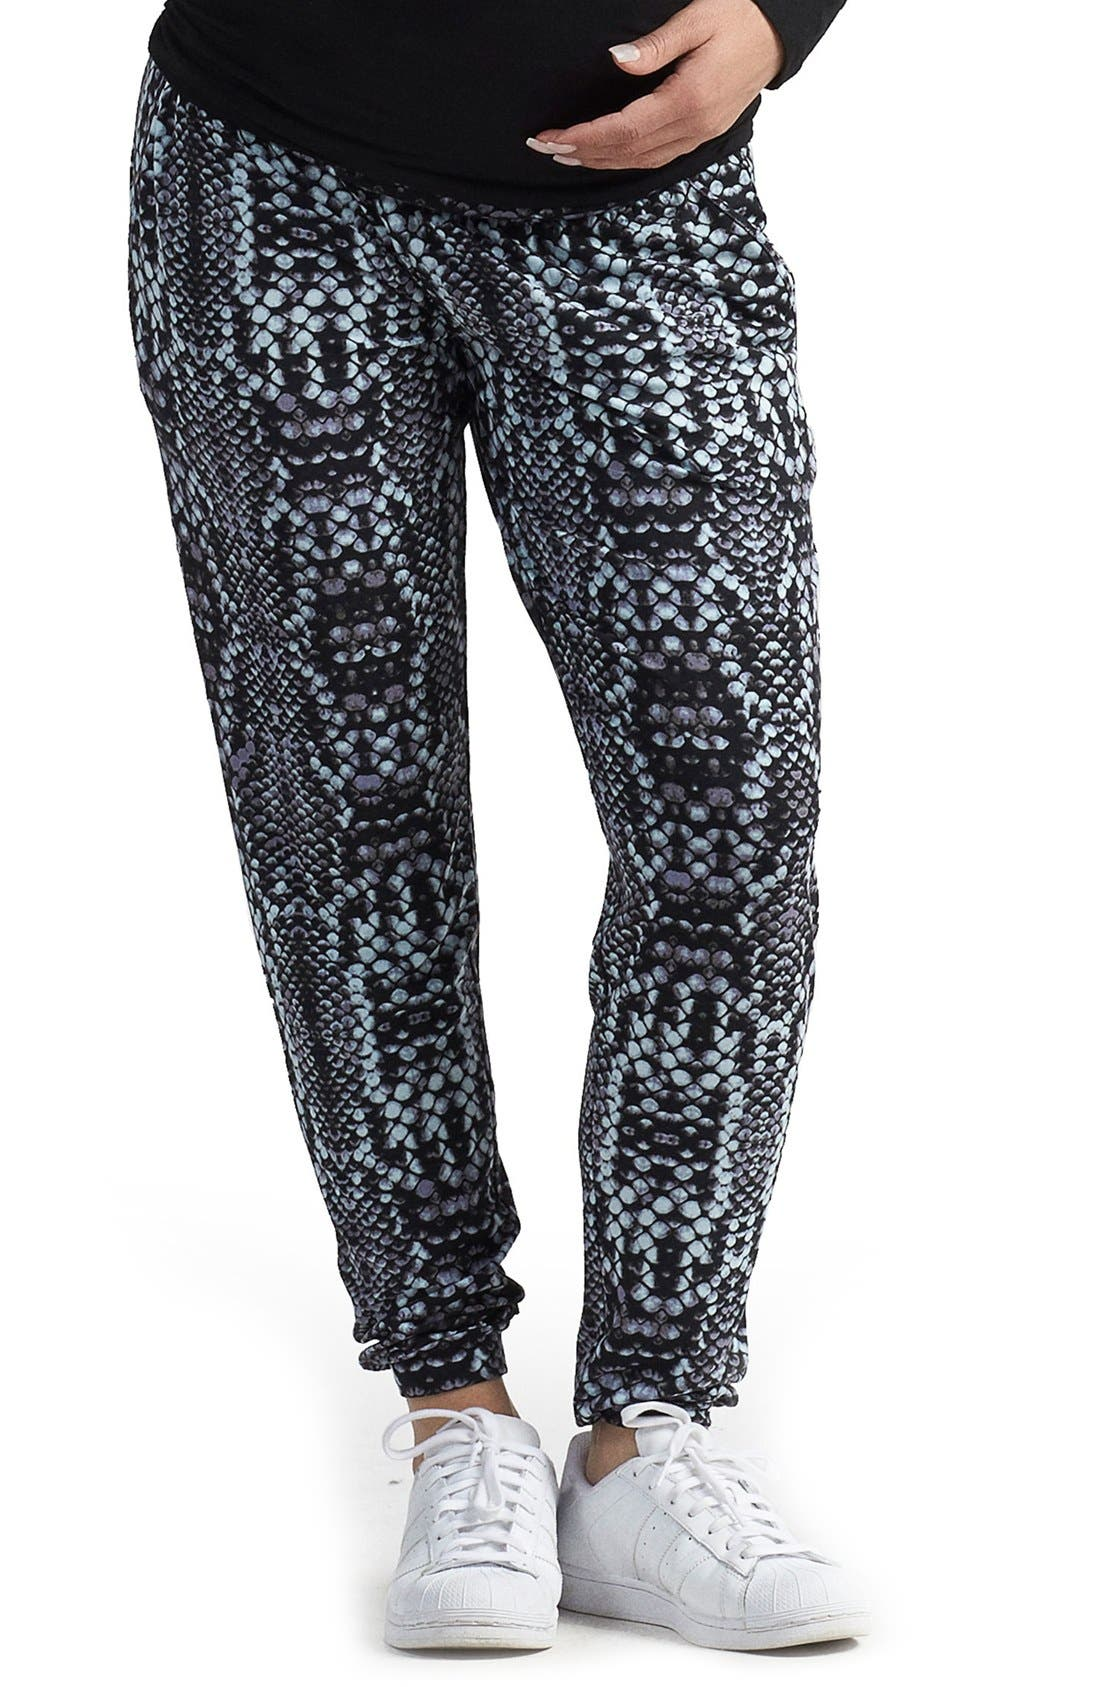 'Liviana' Tapered Maternity Pants,                         Main,                         color, Python Tintype